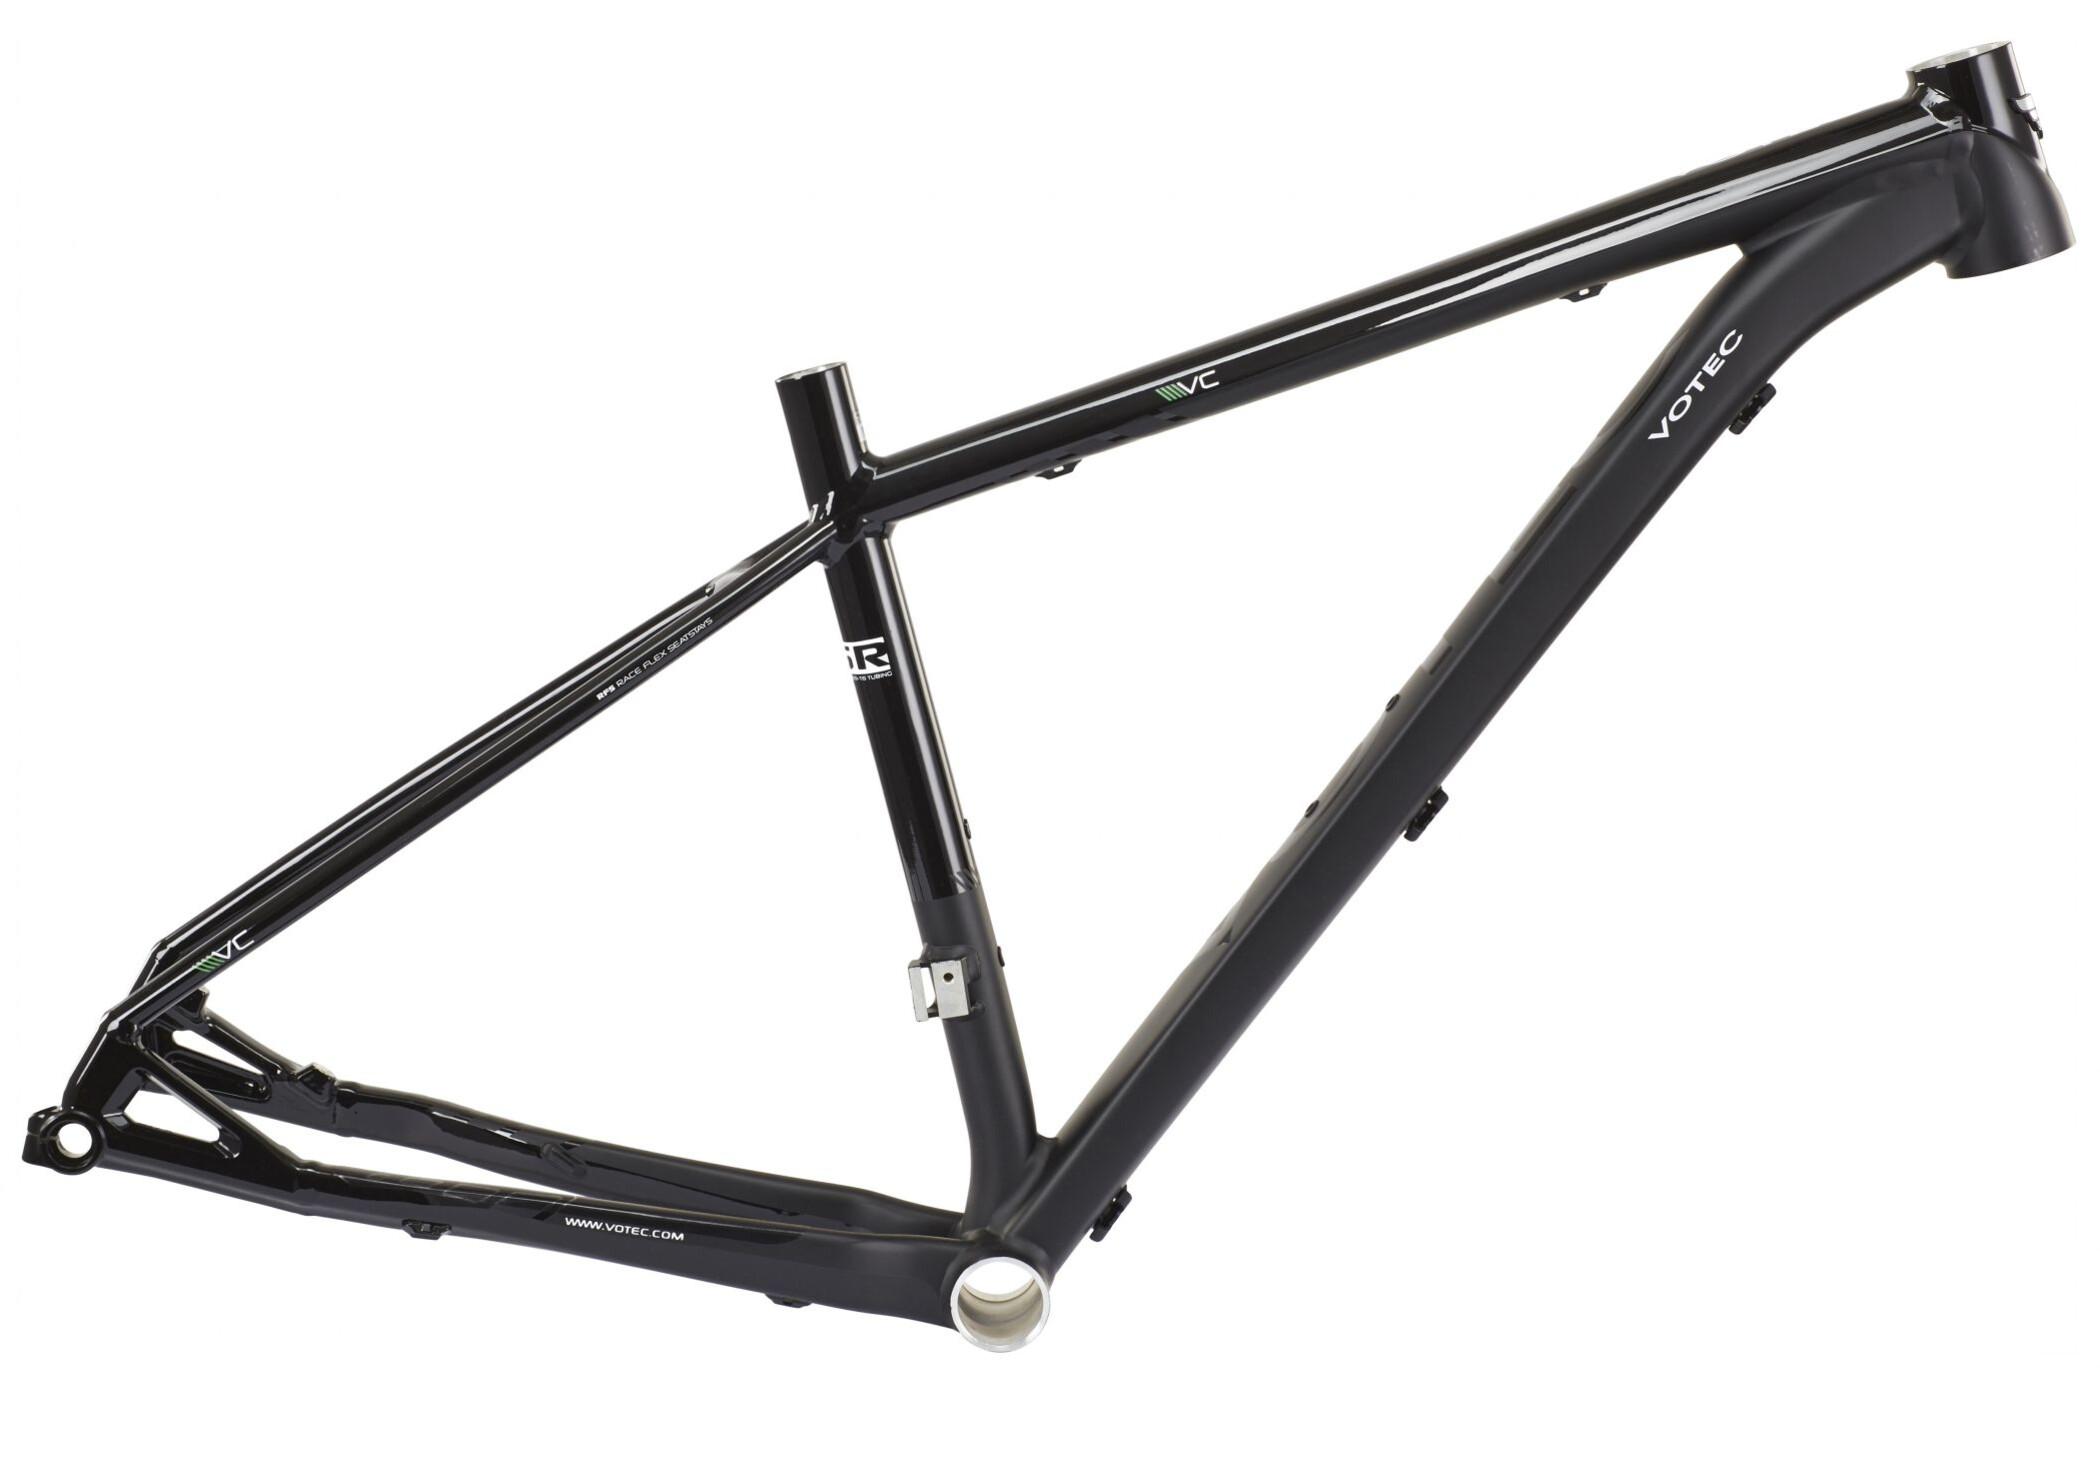 VOTEC VC Set de Cuadro MTB Rígida 29 - negro anonizado | Bikester.es